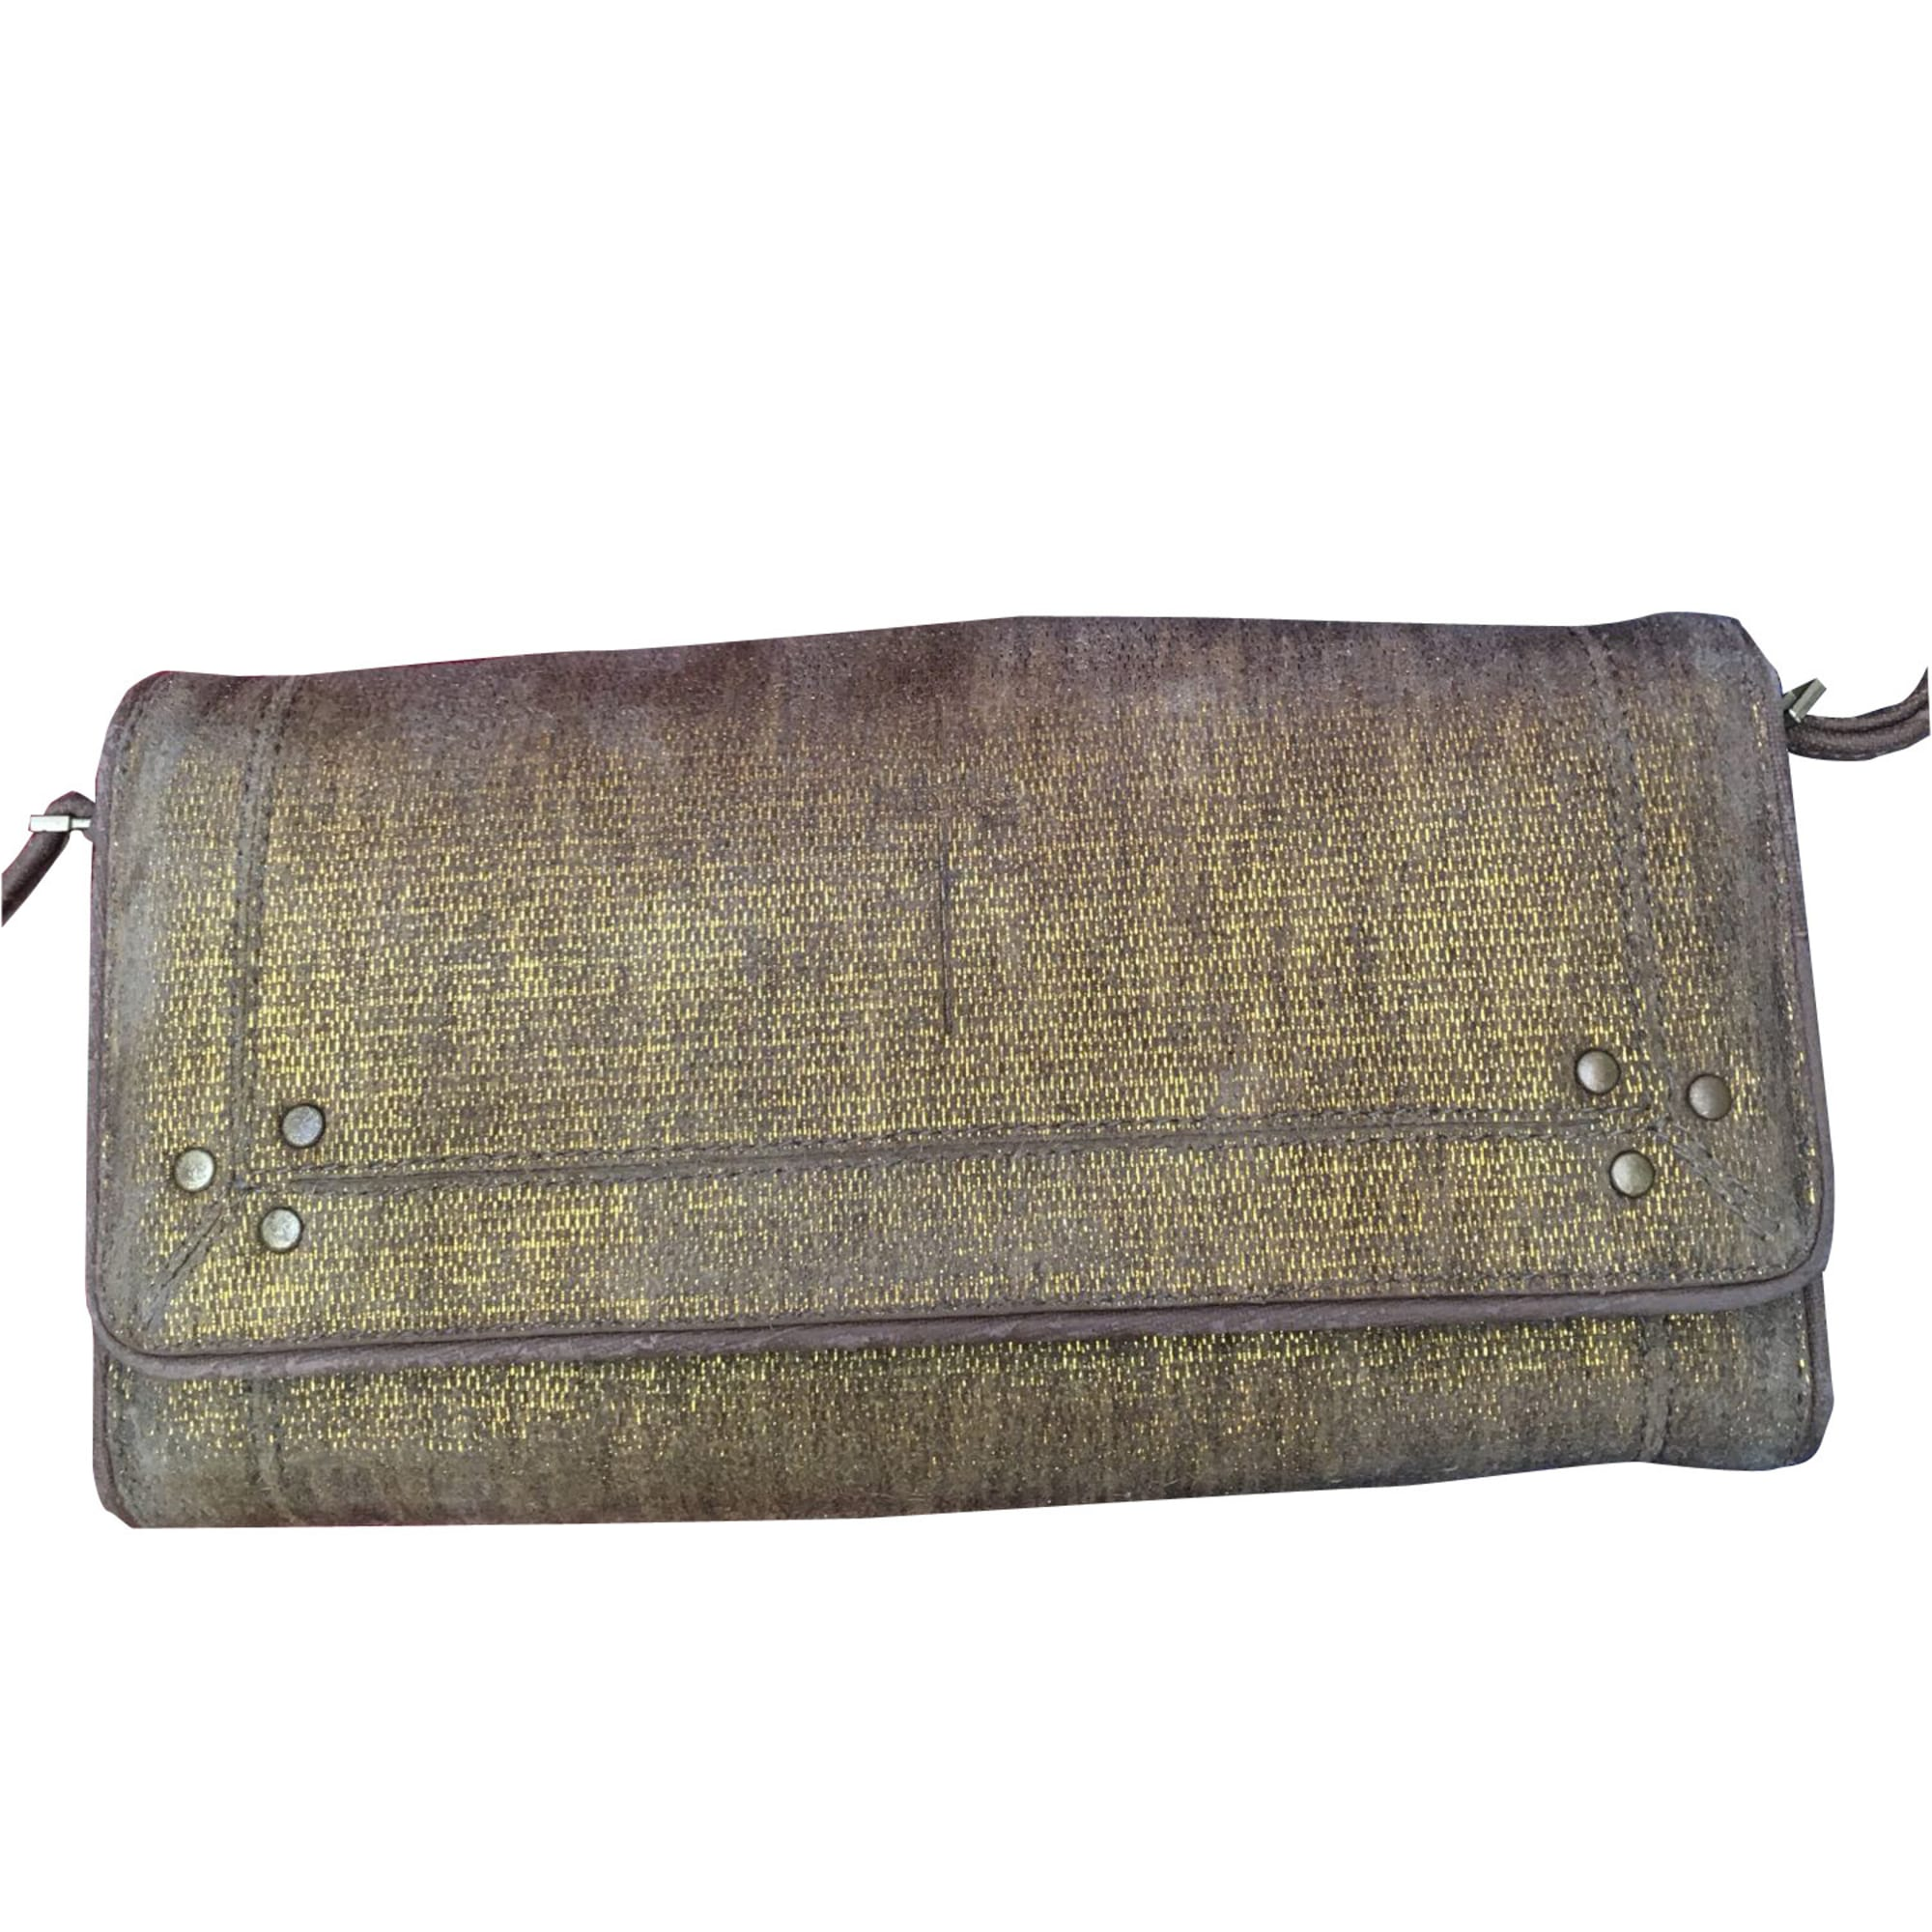 Wallet JEROME DREYFUSS Golden, bronze, copper